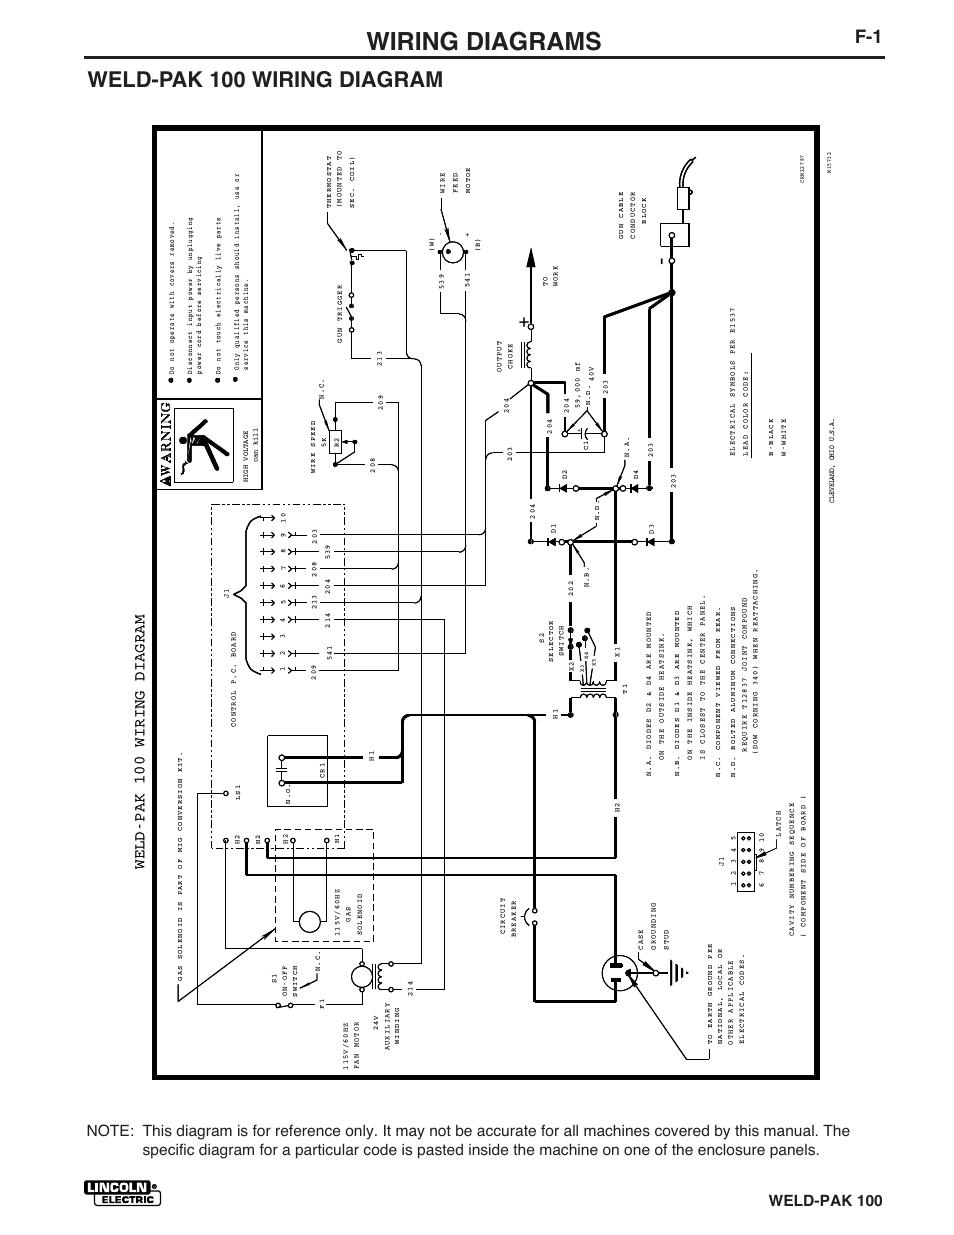 electric motor wiring diagram symbols 1996 ford explorer fuse diagrams, weld-pak 100 diagram,   lincoln weld-pack plus ...